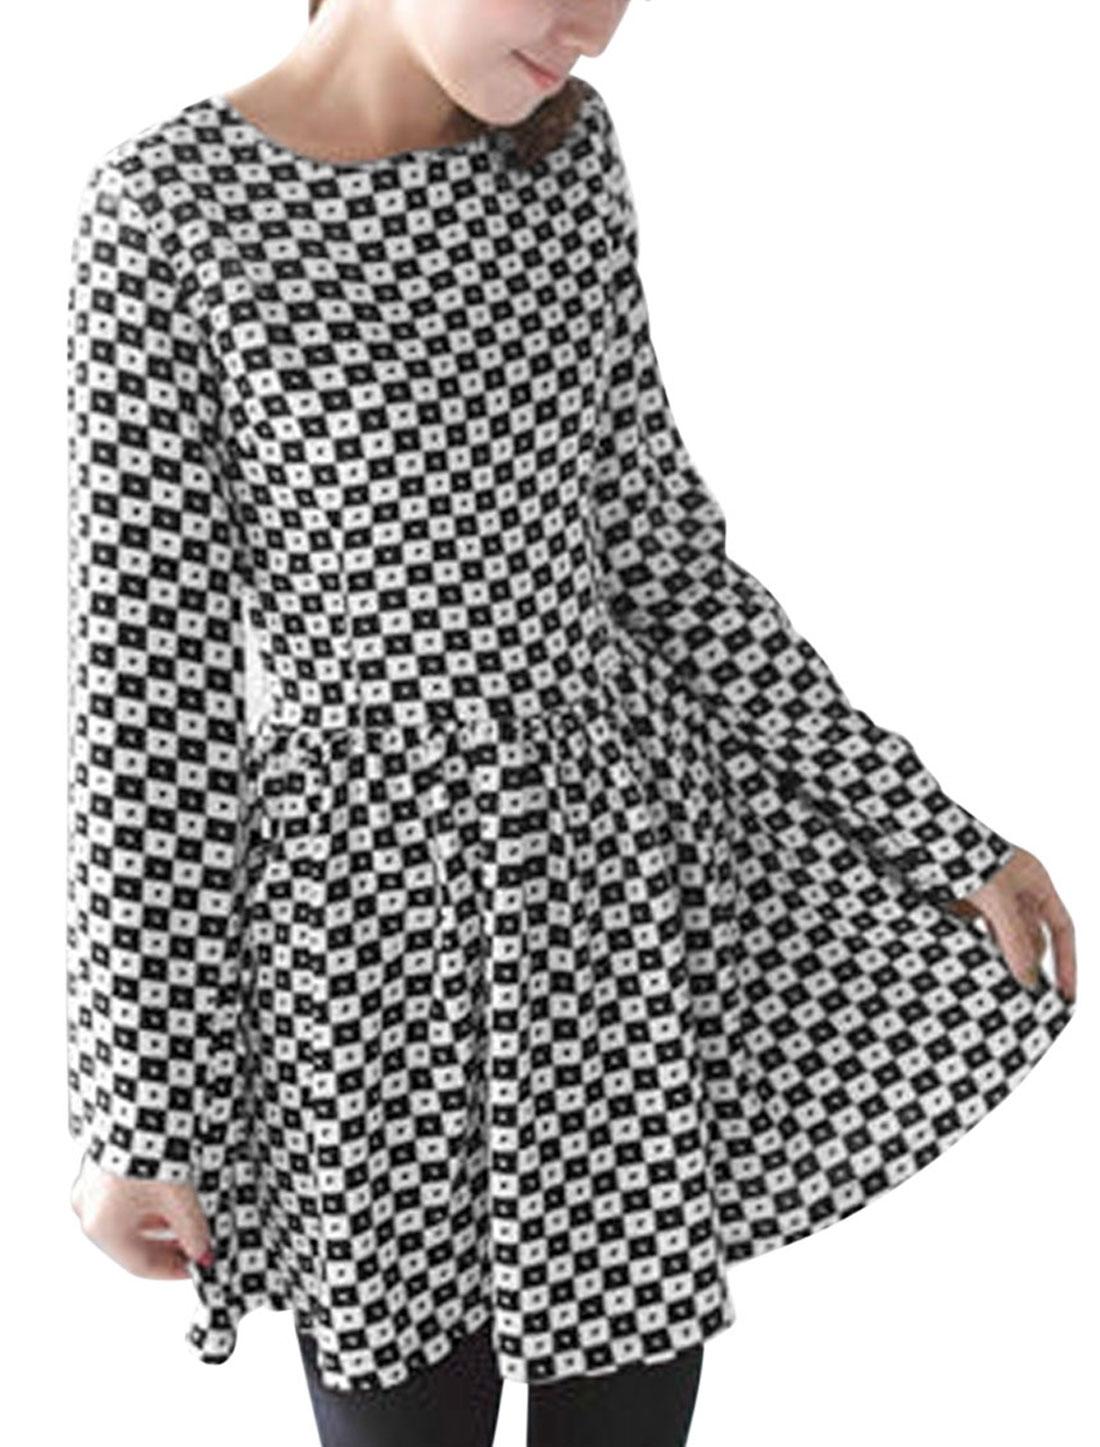 Women Hearts Pattern Long Sleeves Casual Skater Dress Black White S